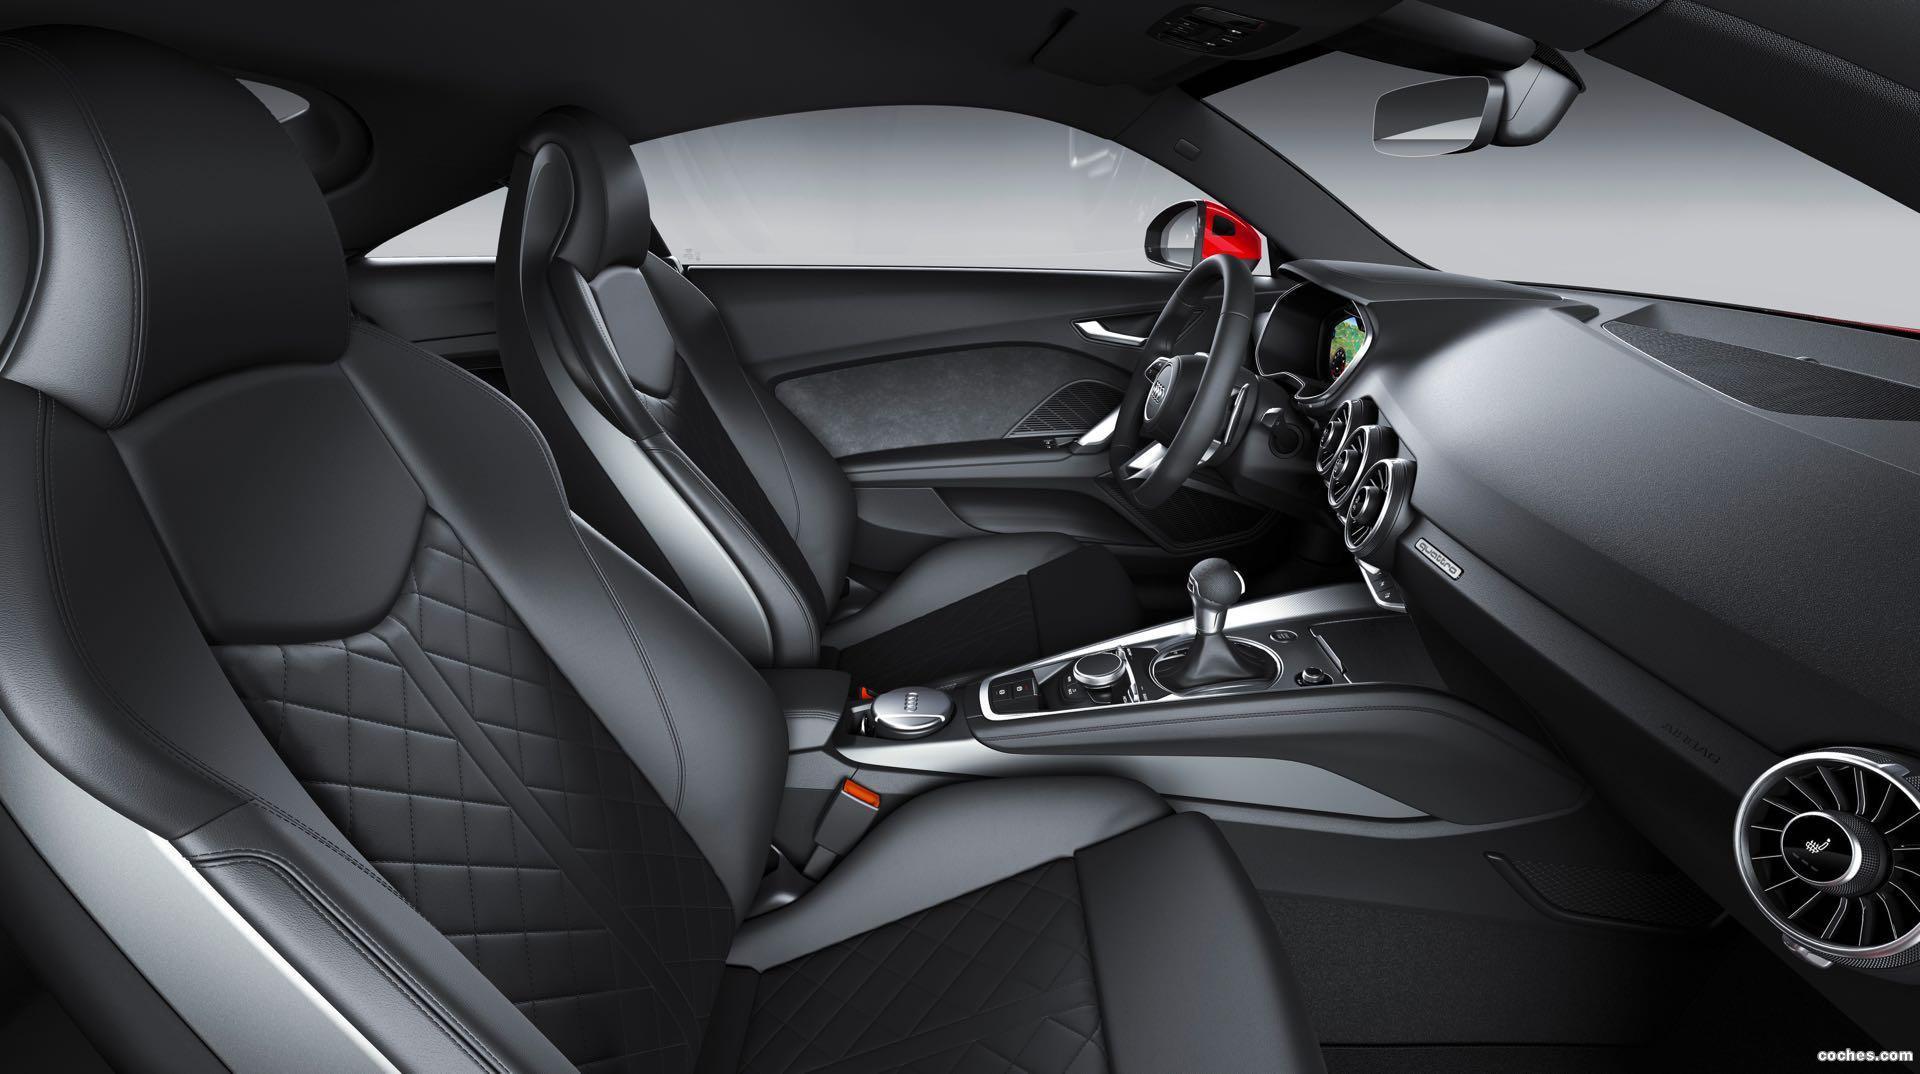 Foto 9 de Audi TT Coupe 45 TFSI quattro 2019